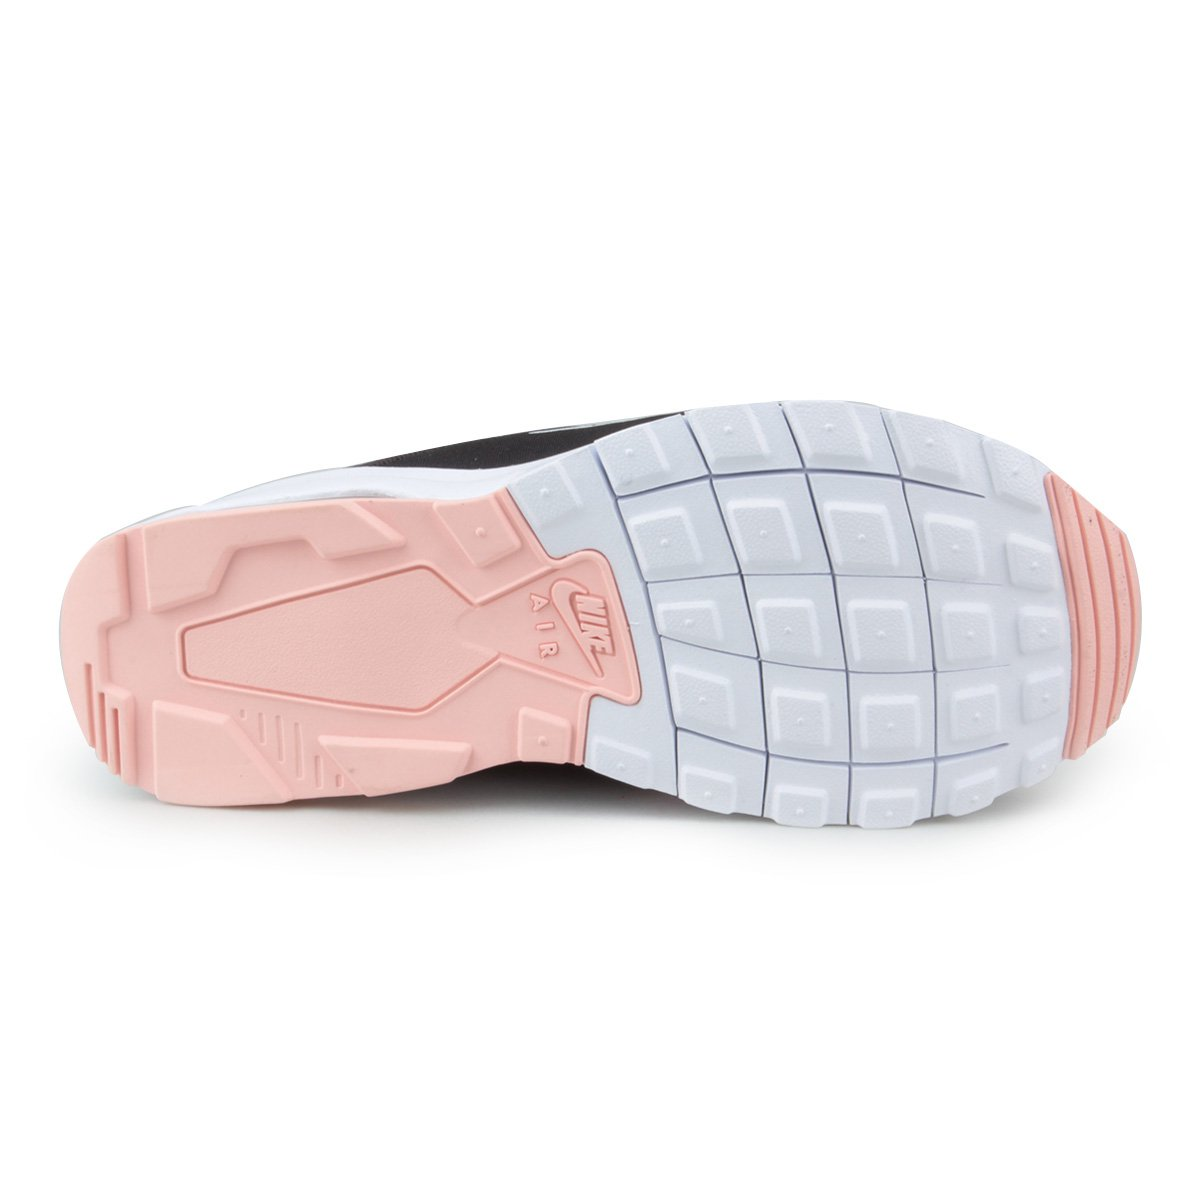 Tênis Nike Air Max Motion Racer 2 - Branco e Preto - Compre Agora ... 2b60c350d3b2c